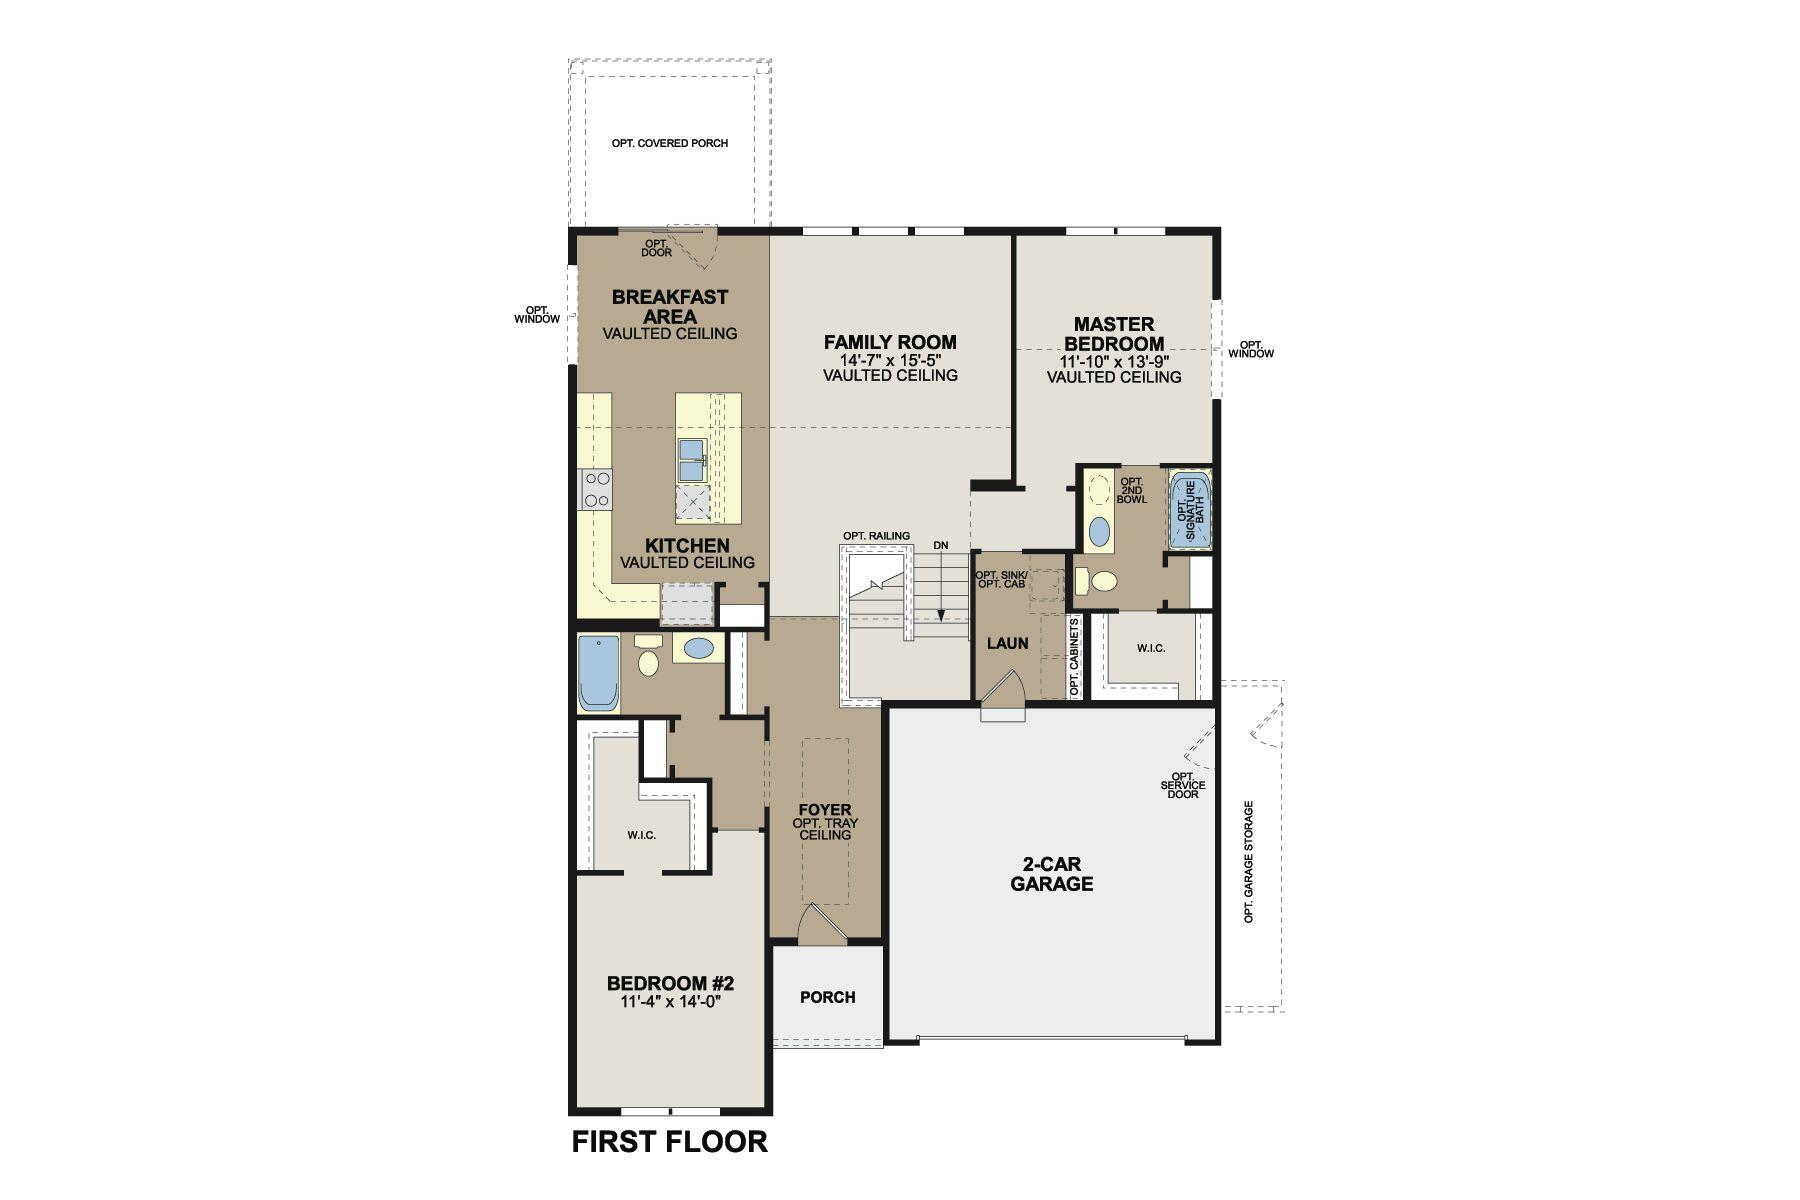 Faulkner Floorplan